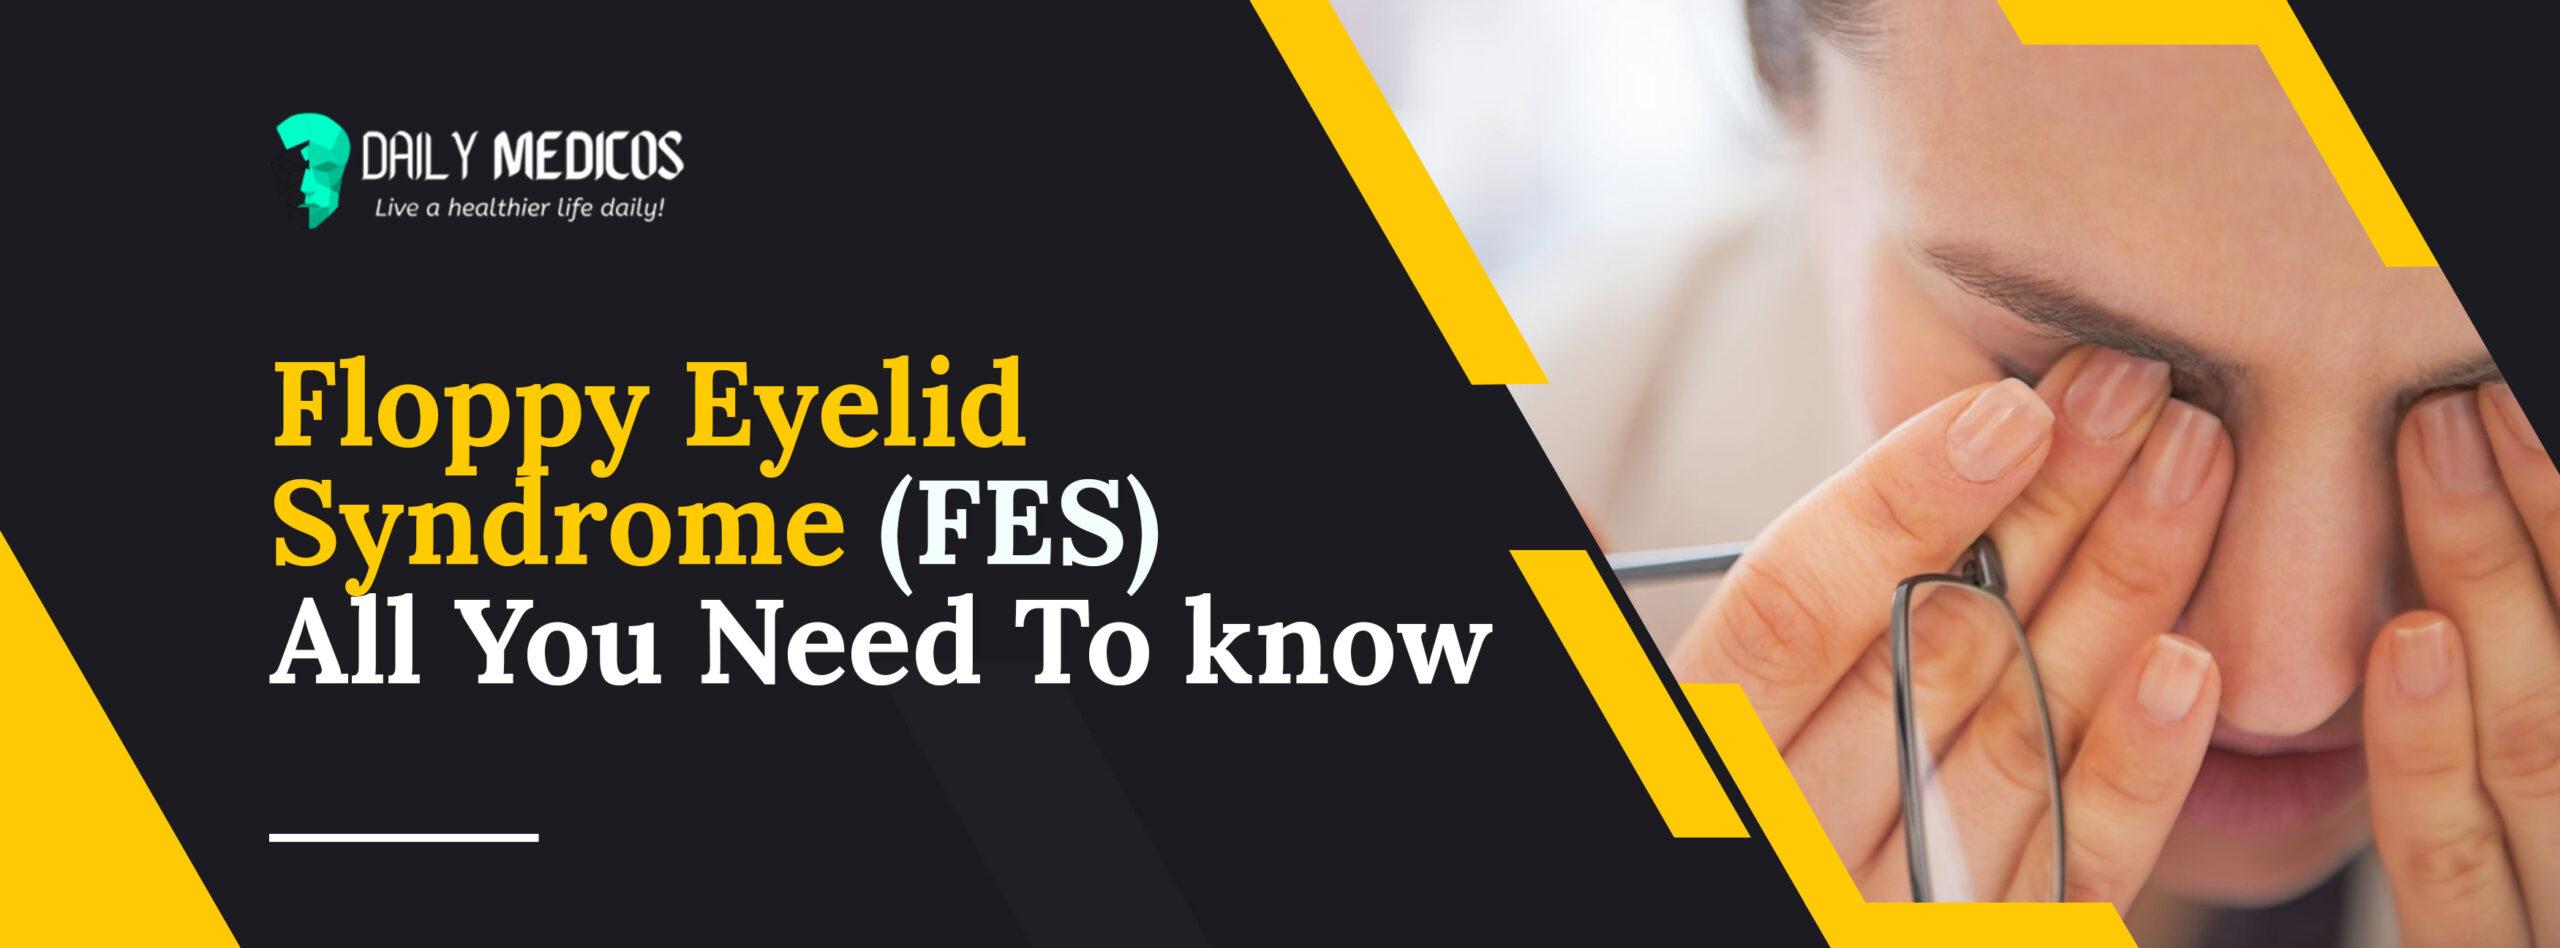 Floppy Eyelid Syndrome (FES): Causes, Symptoms, & Treatment 1 - Daily Medicos